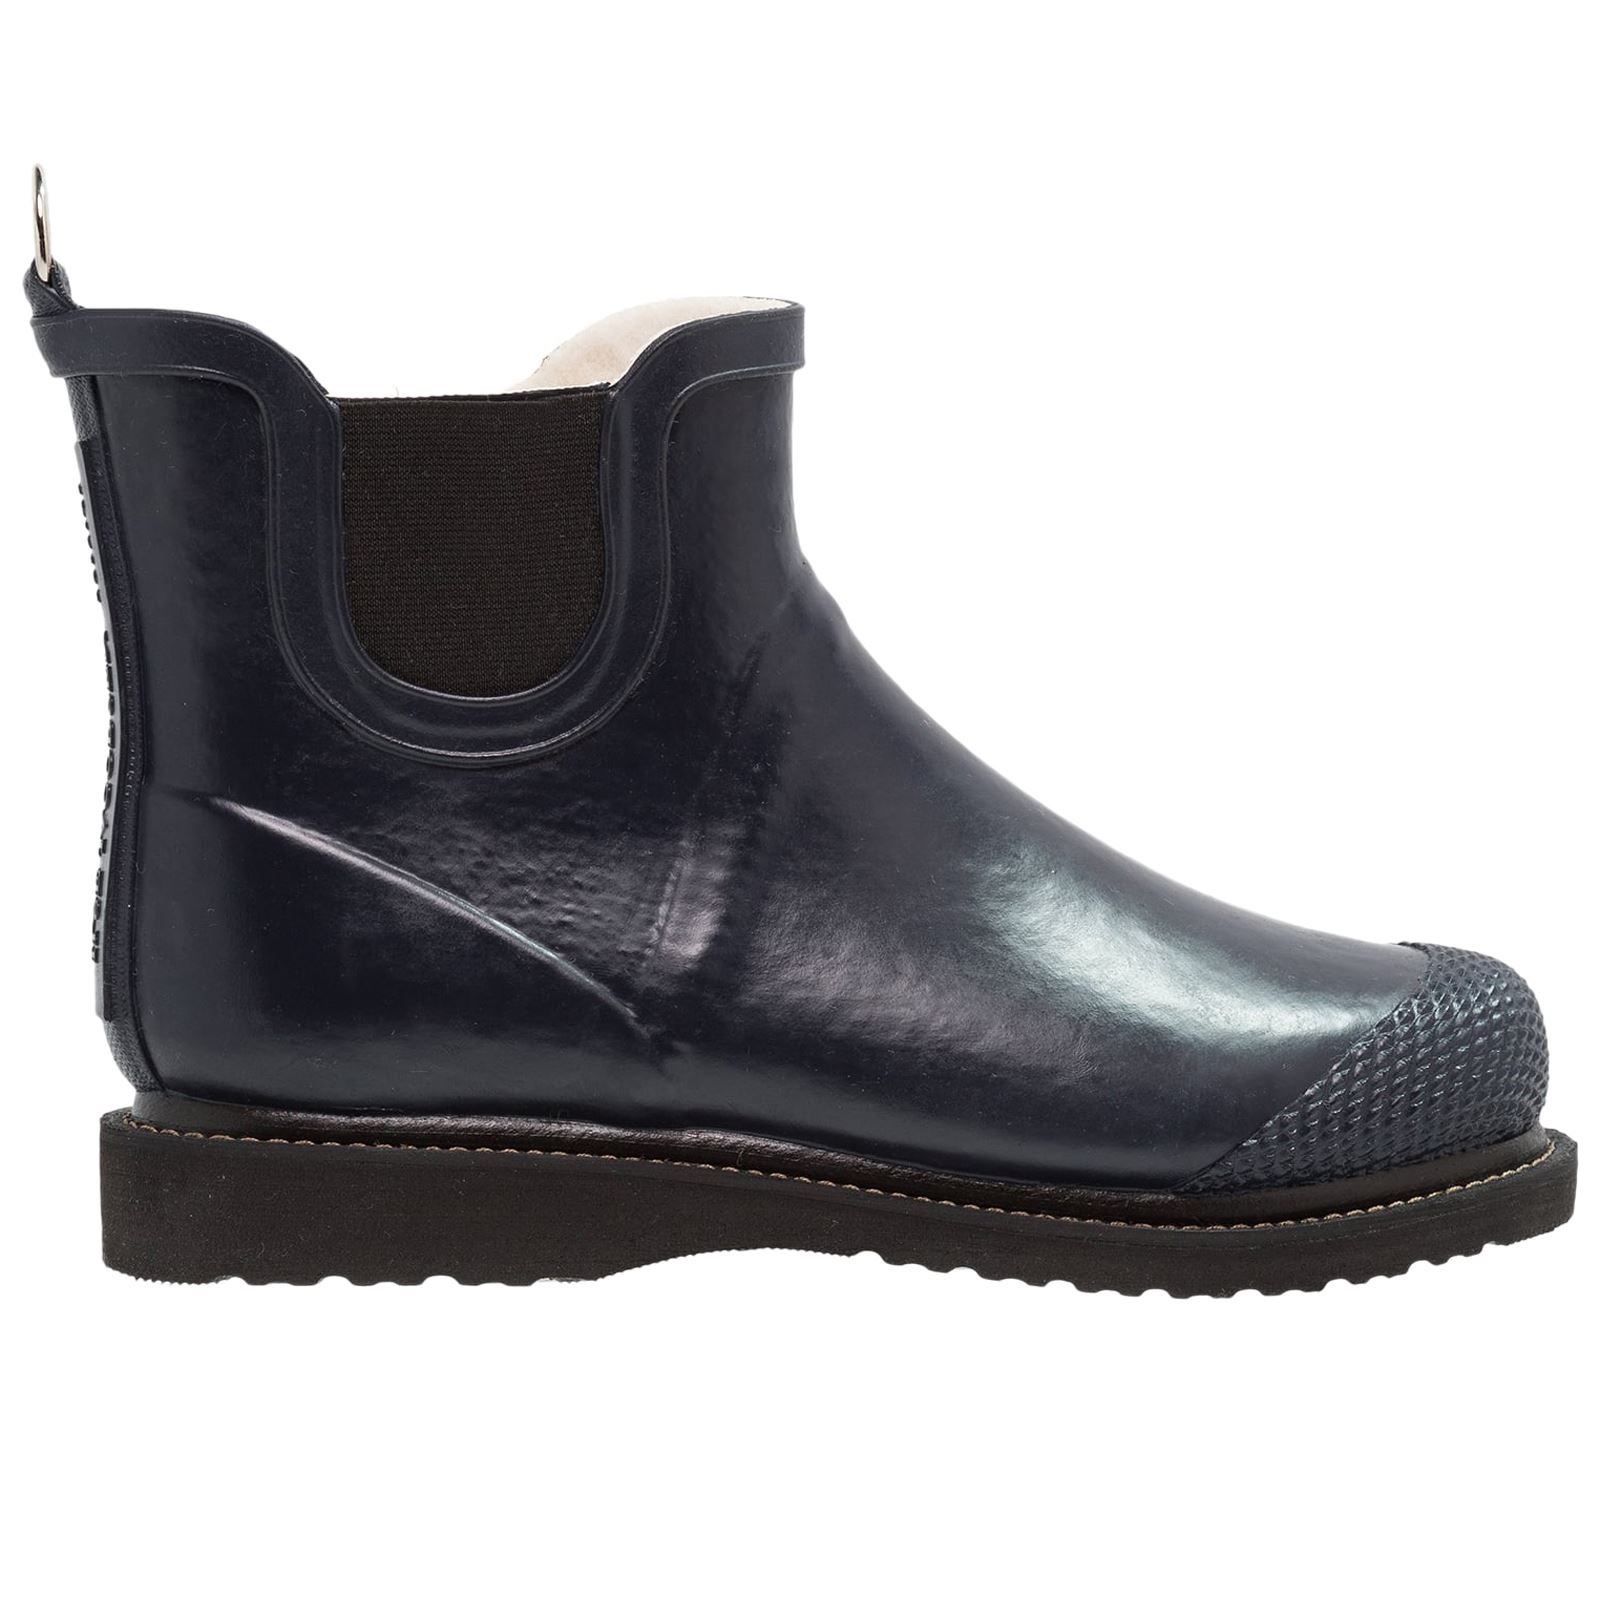 Ilse Jacobsen Women's Short Rubber Boot,Dark Indigo,EU 40 M by ILSE JACOBSEN (Image #1)